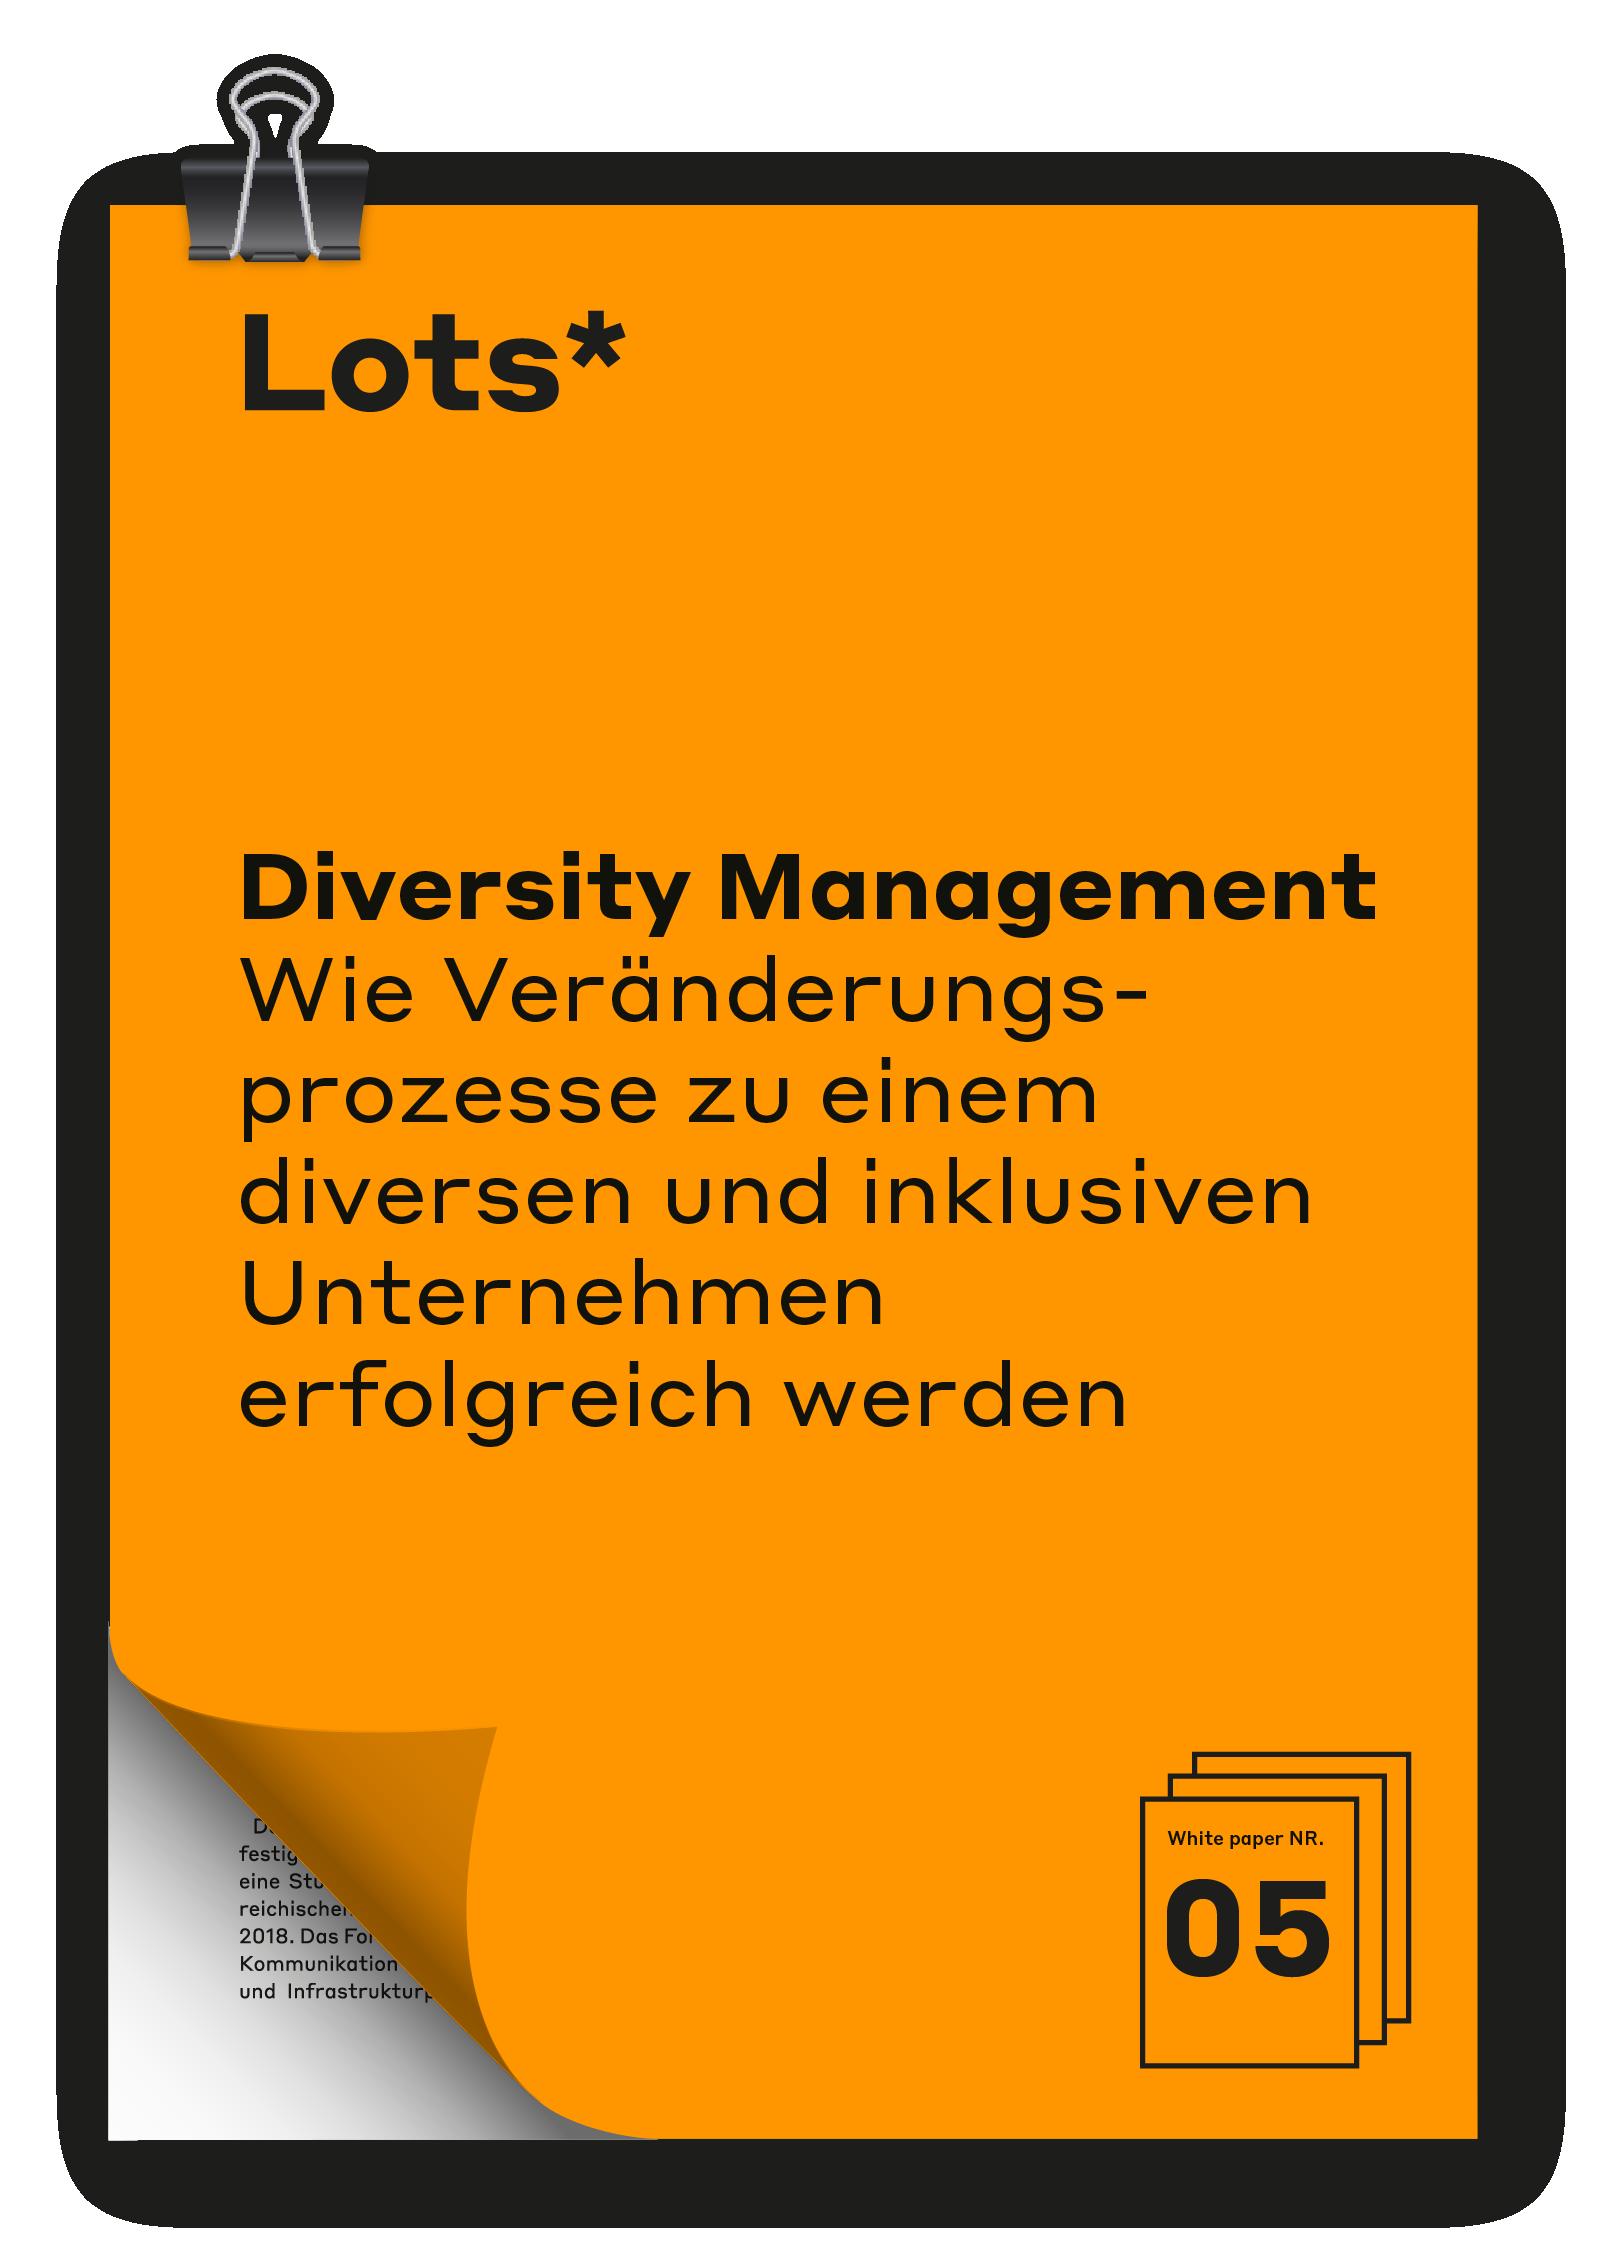 WP_DiversityManagement_Whitepaper_Diversity